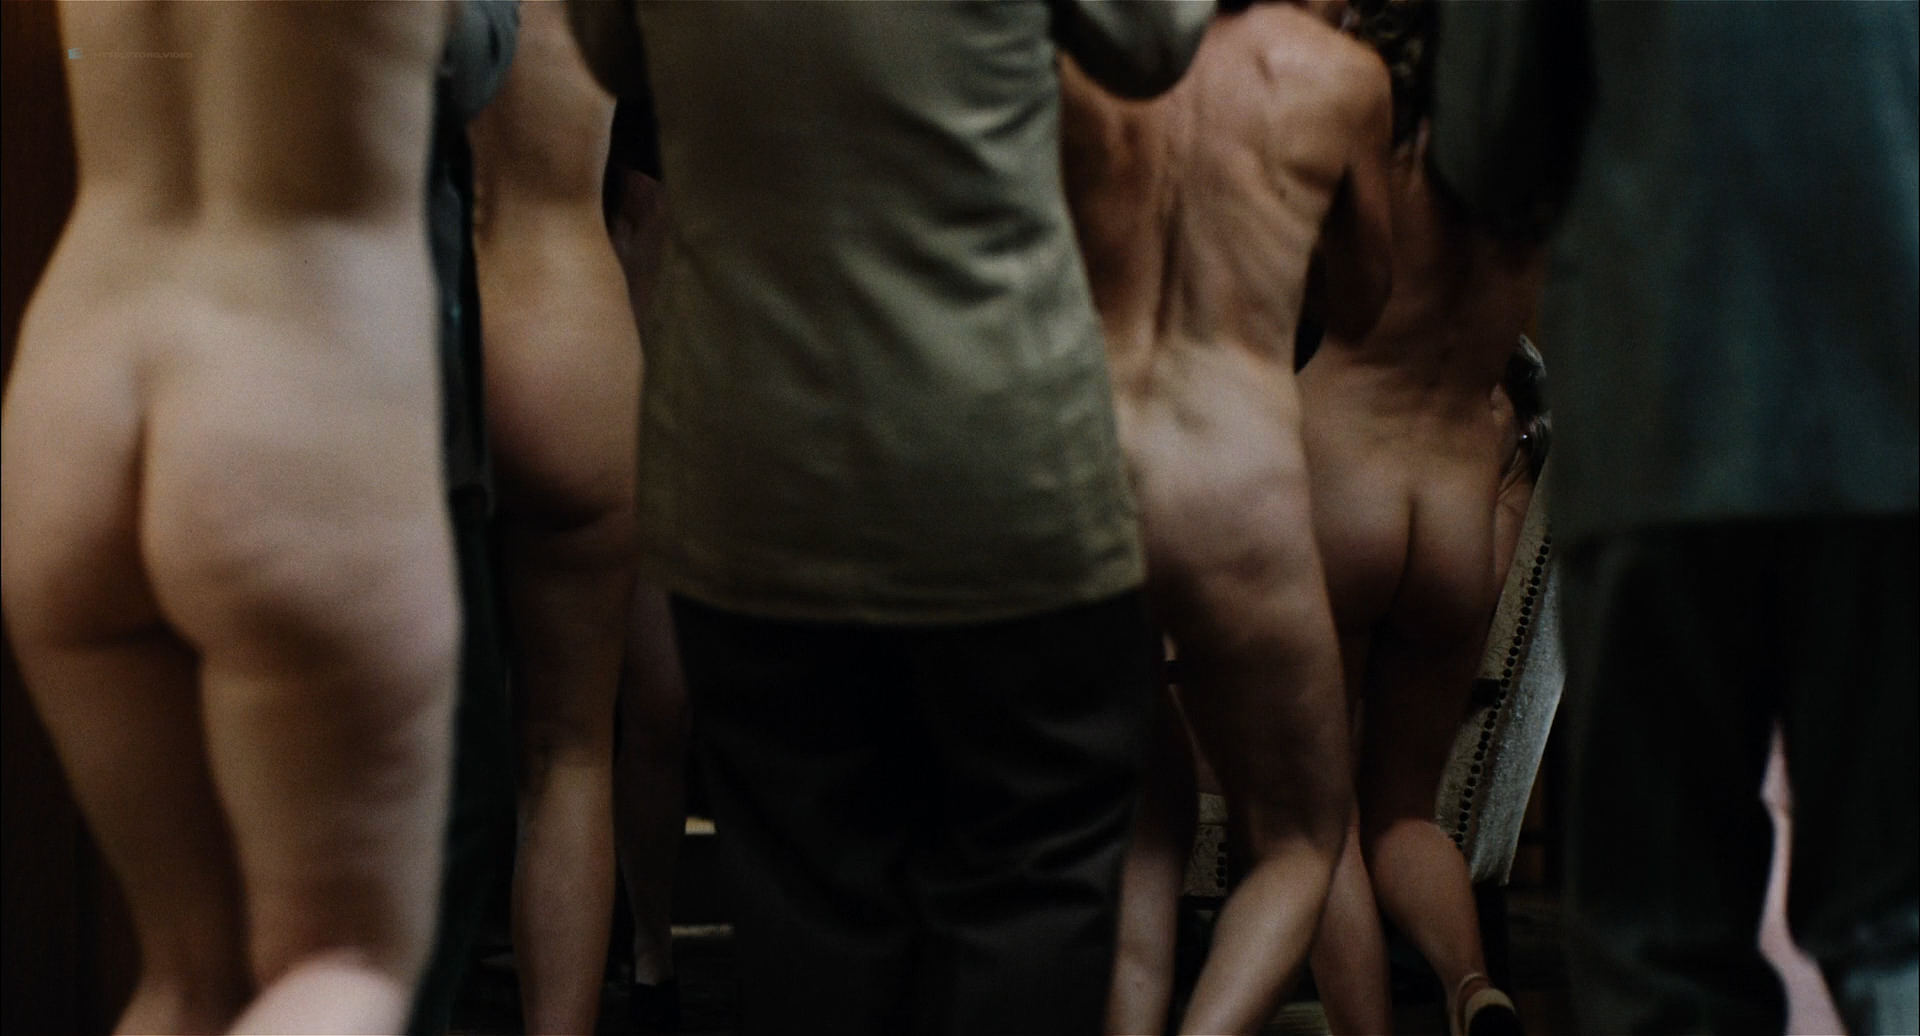 Free amy ferguson nude topless, liz clare, katie boland nude dancing amy adams photo